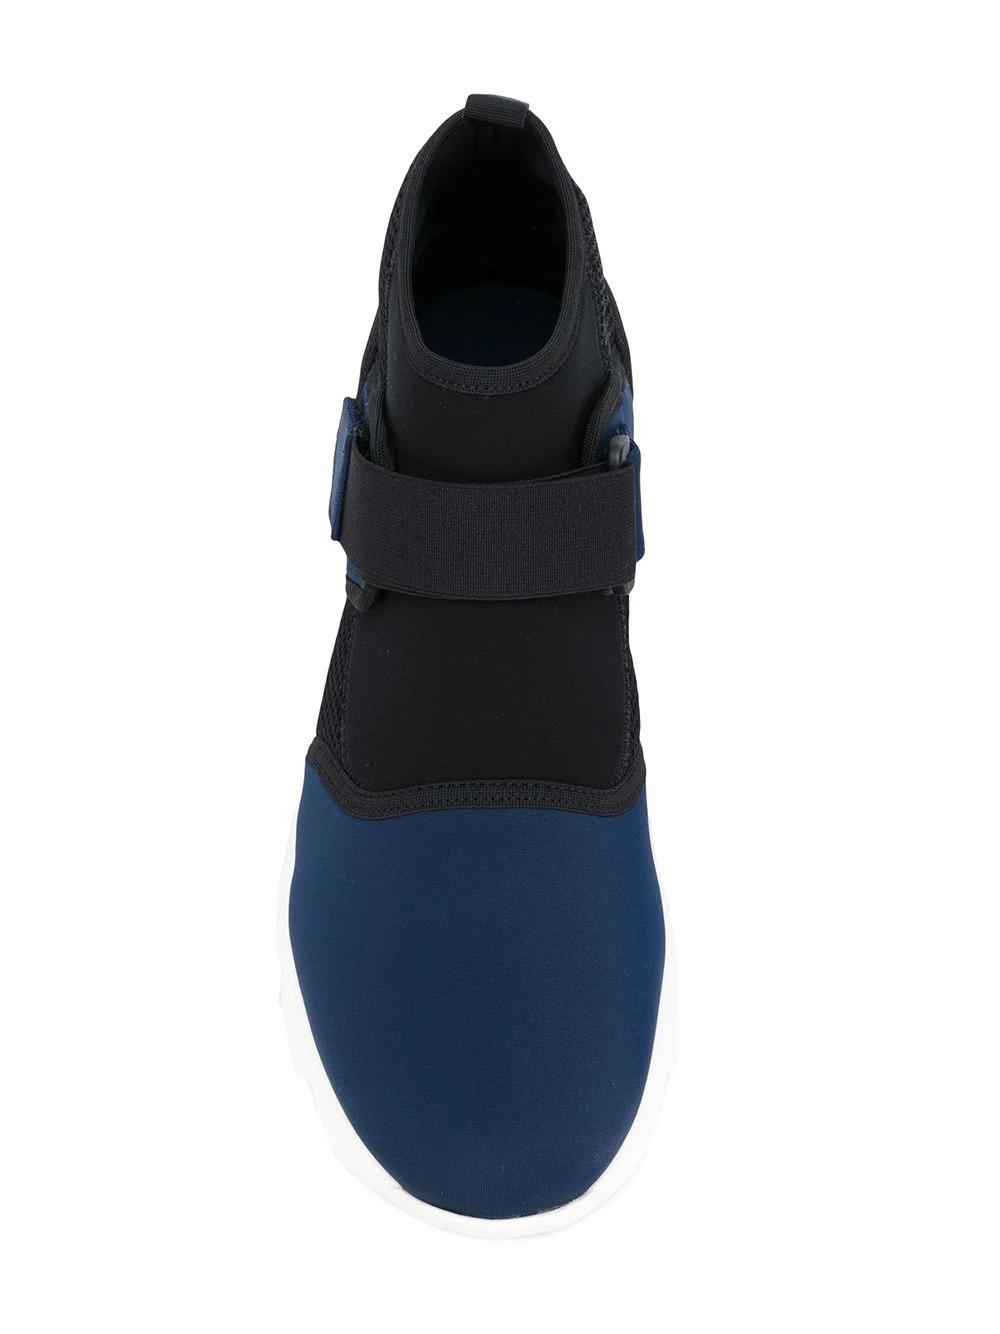 Marni | Marni кроссовки на липучке | Clouty